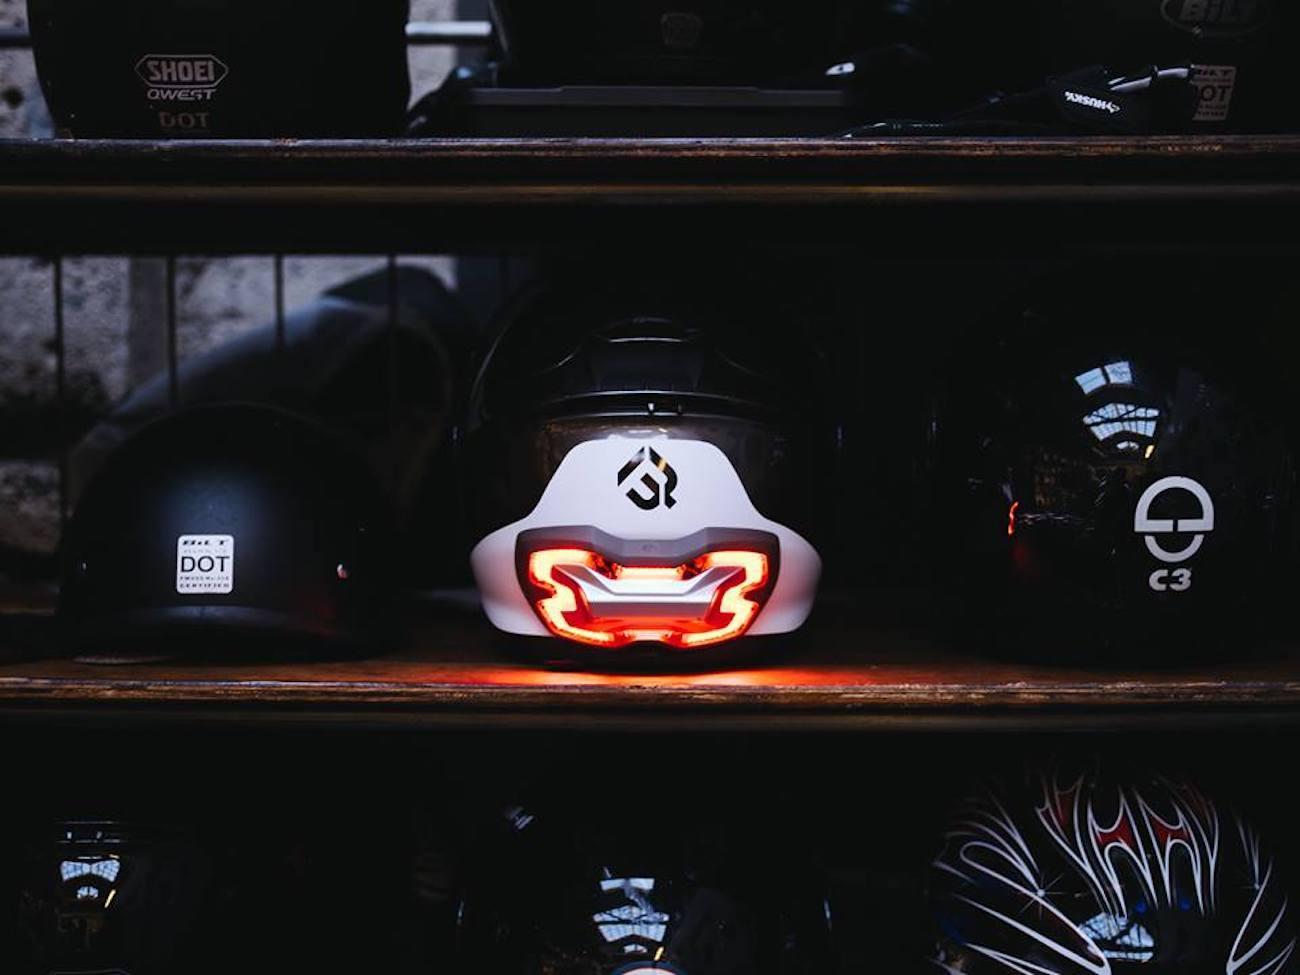 BrakeFree Smart LED Safety Device